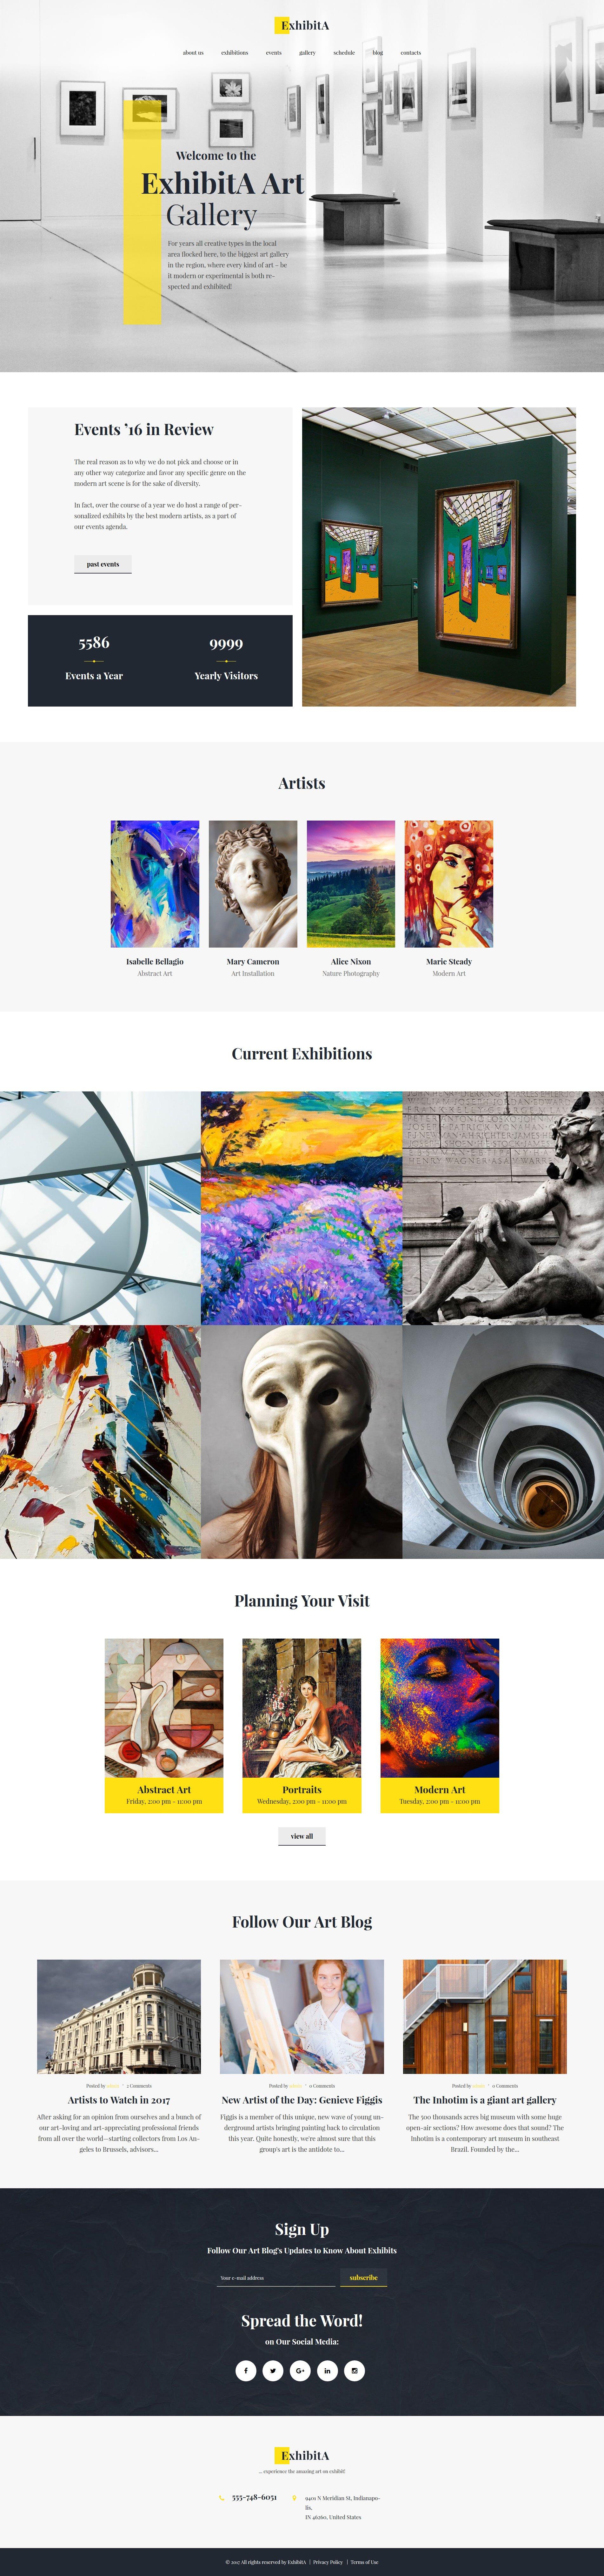 Responsive ExhibitA - Art Gallery Responsive Wordpress #62373 - Ekran resmi